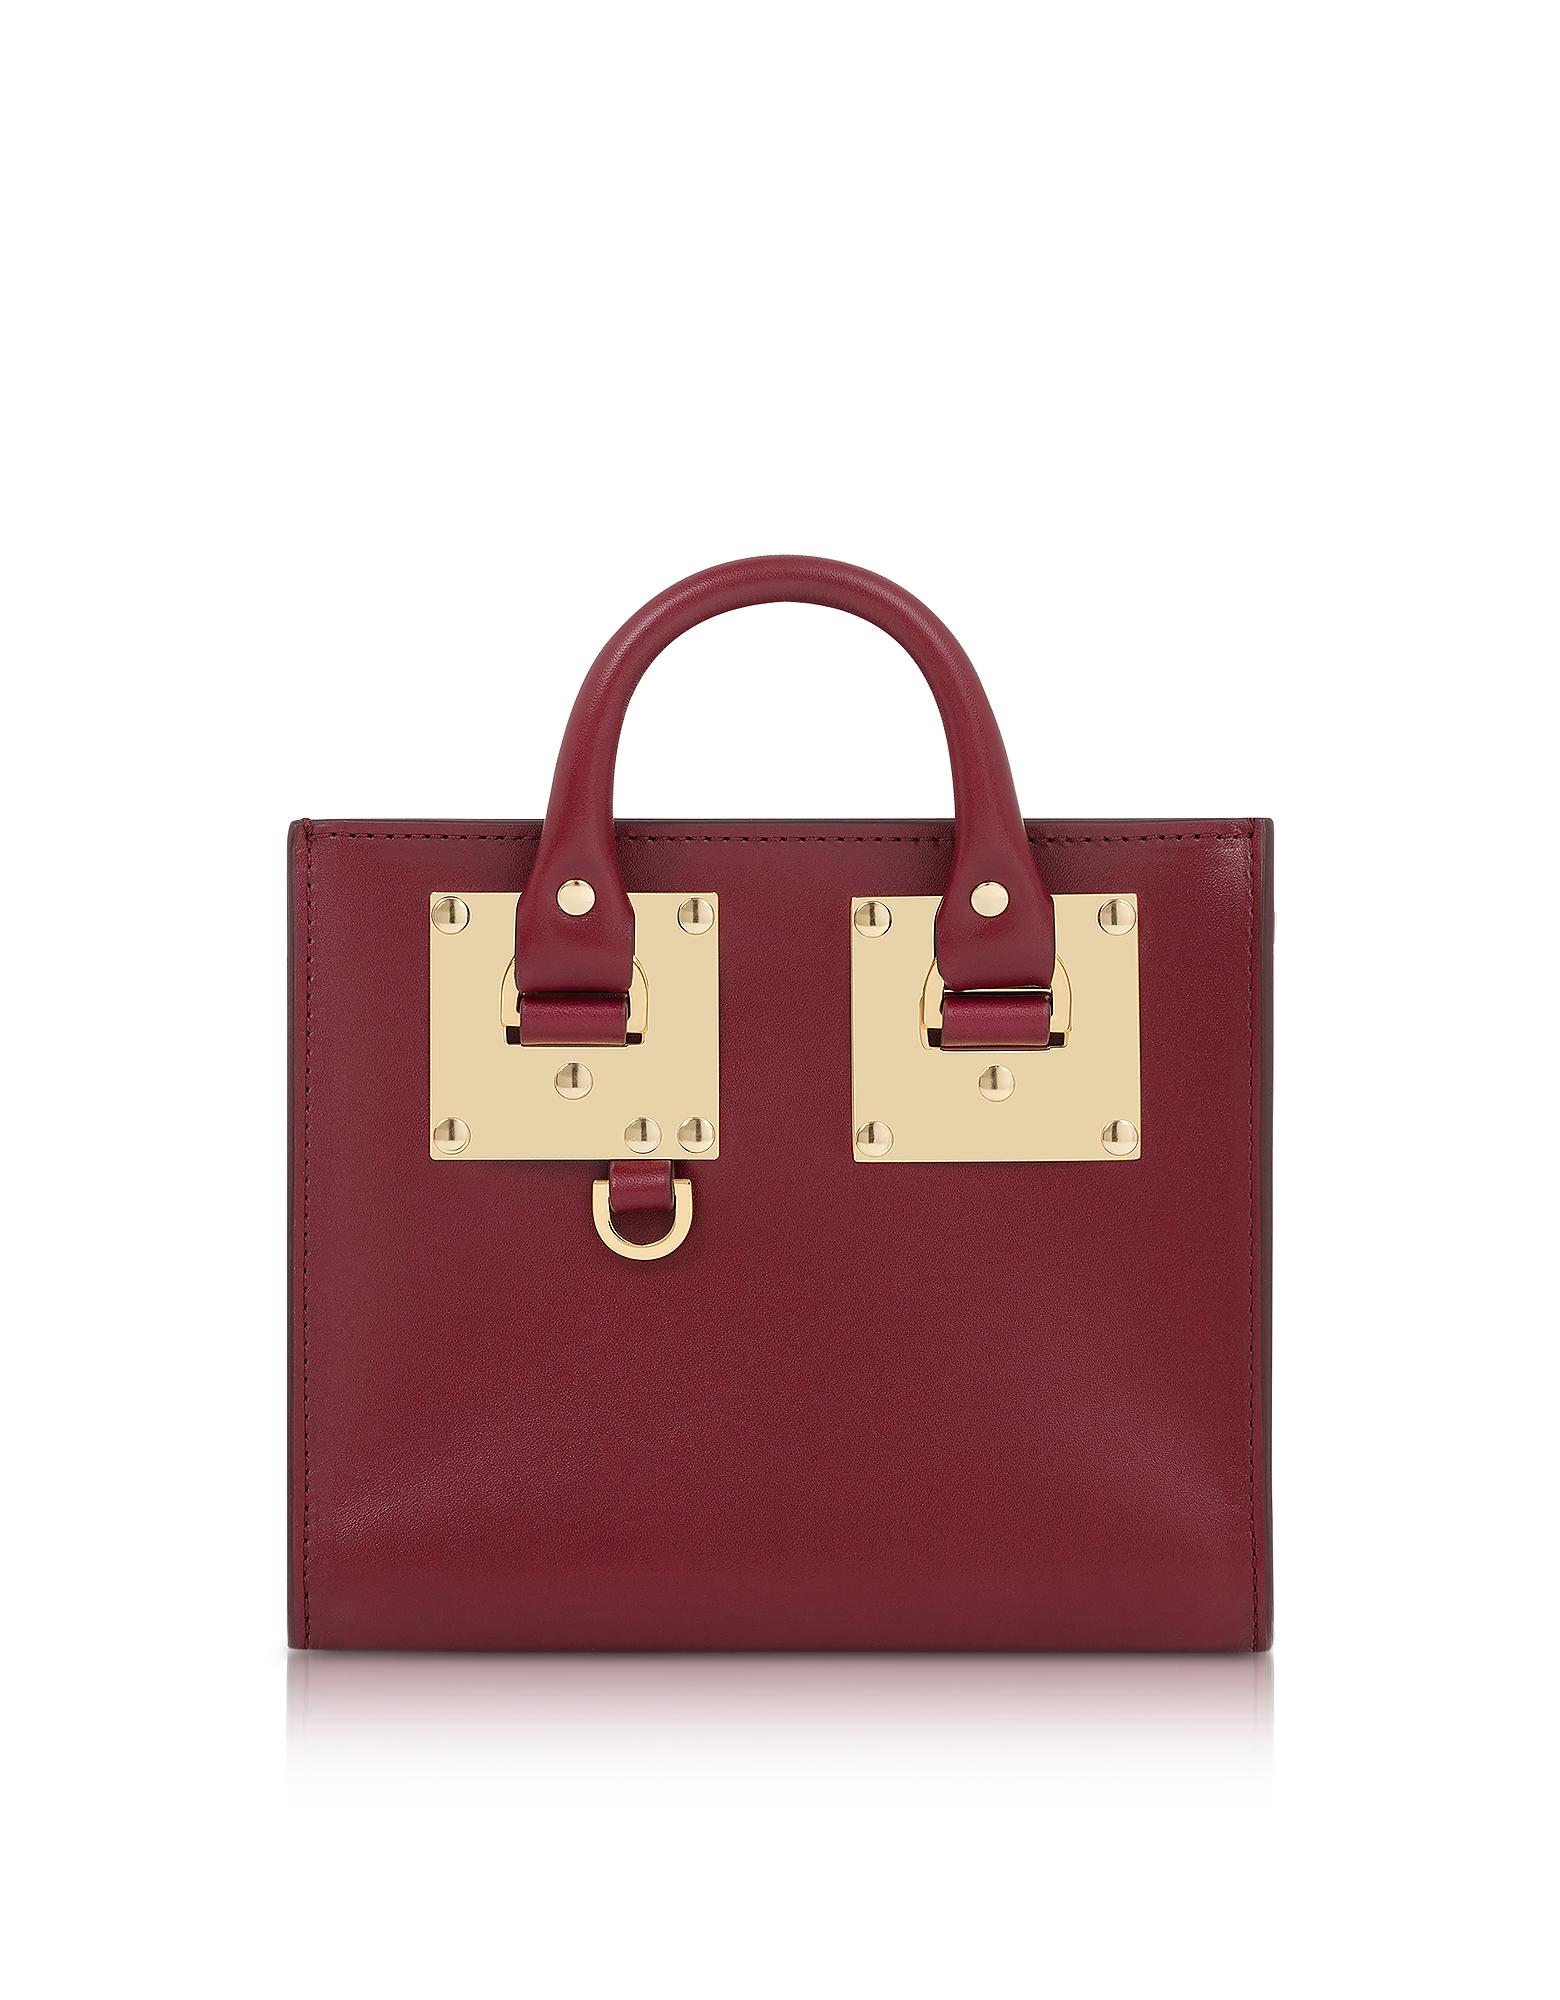 Sophie Hulme Handbags, Dark Red Saddle Leather Albion Box Tote Bag